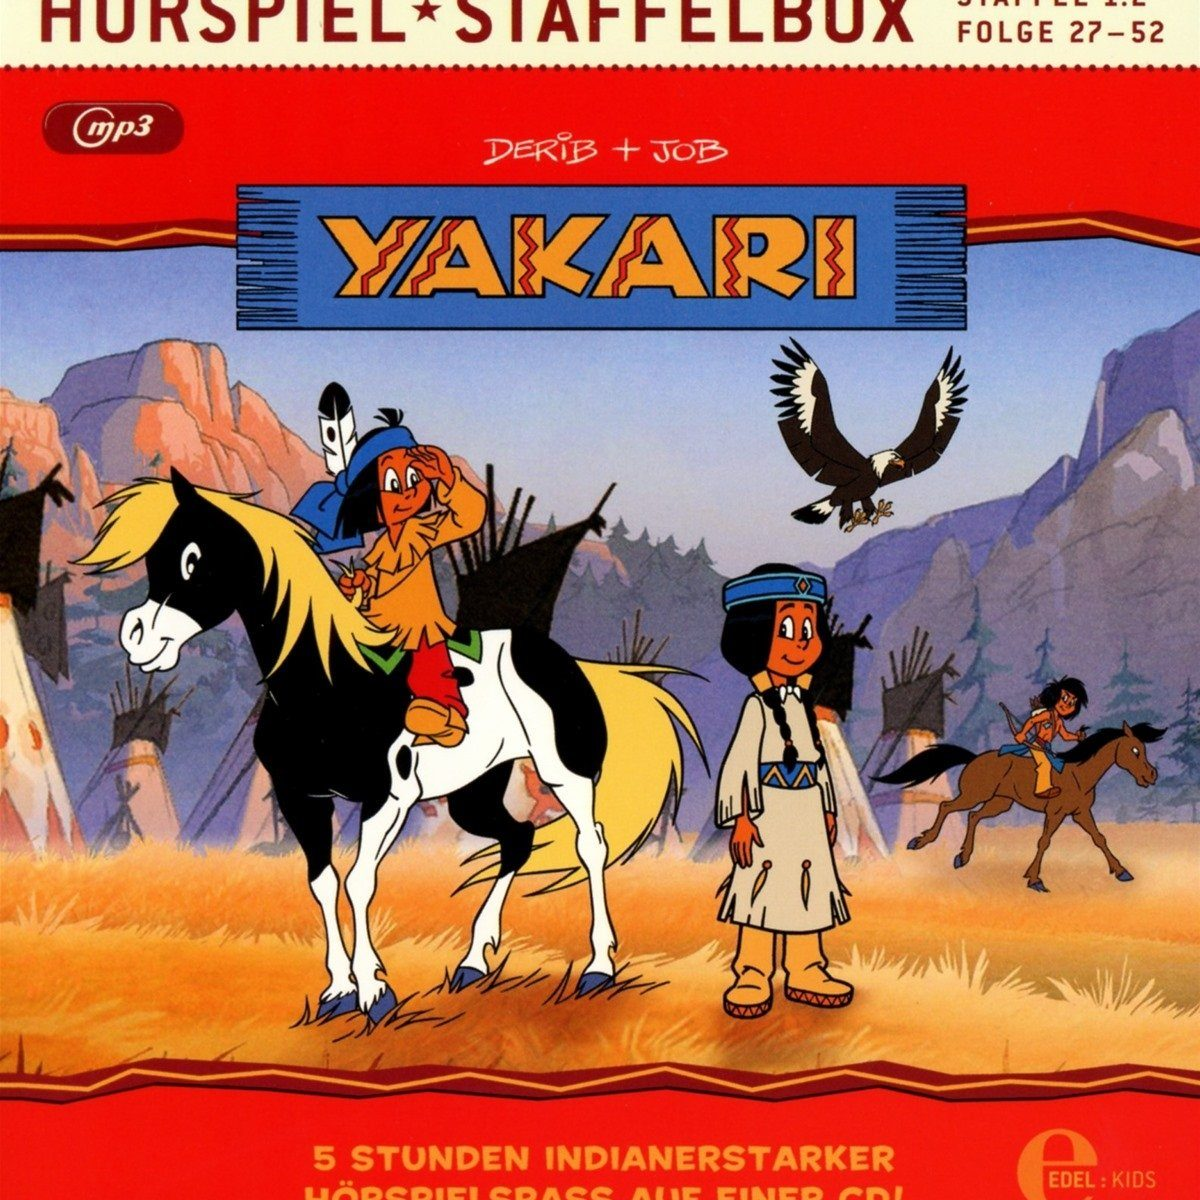 Yakari - Hörspiel Staffelbox - Staffel 1.2